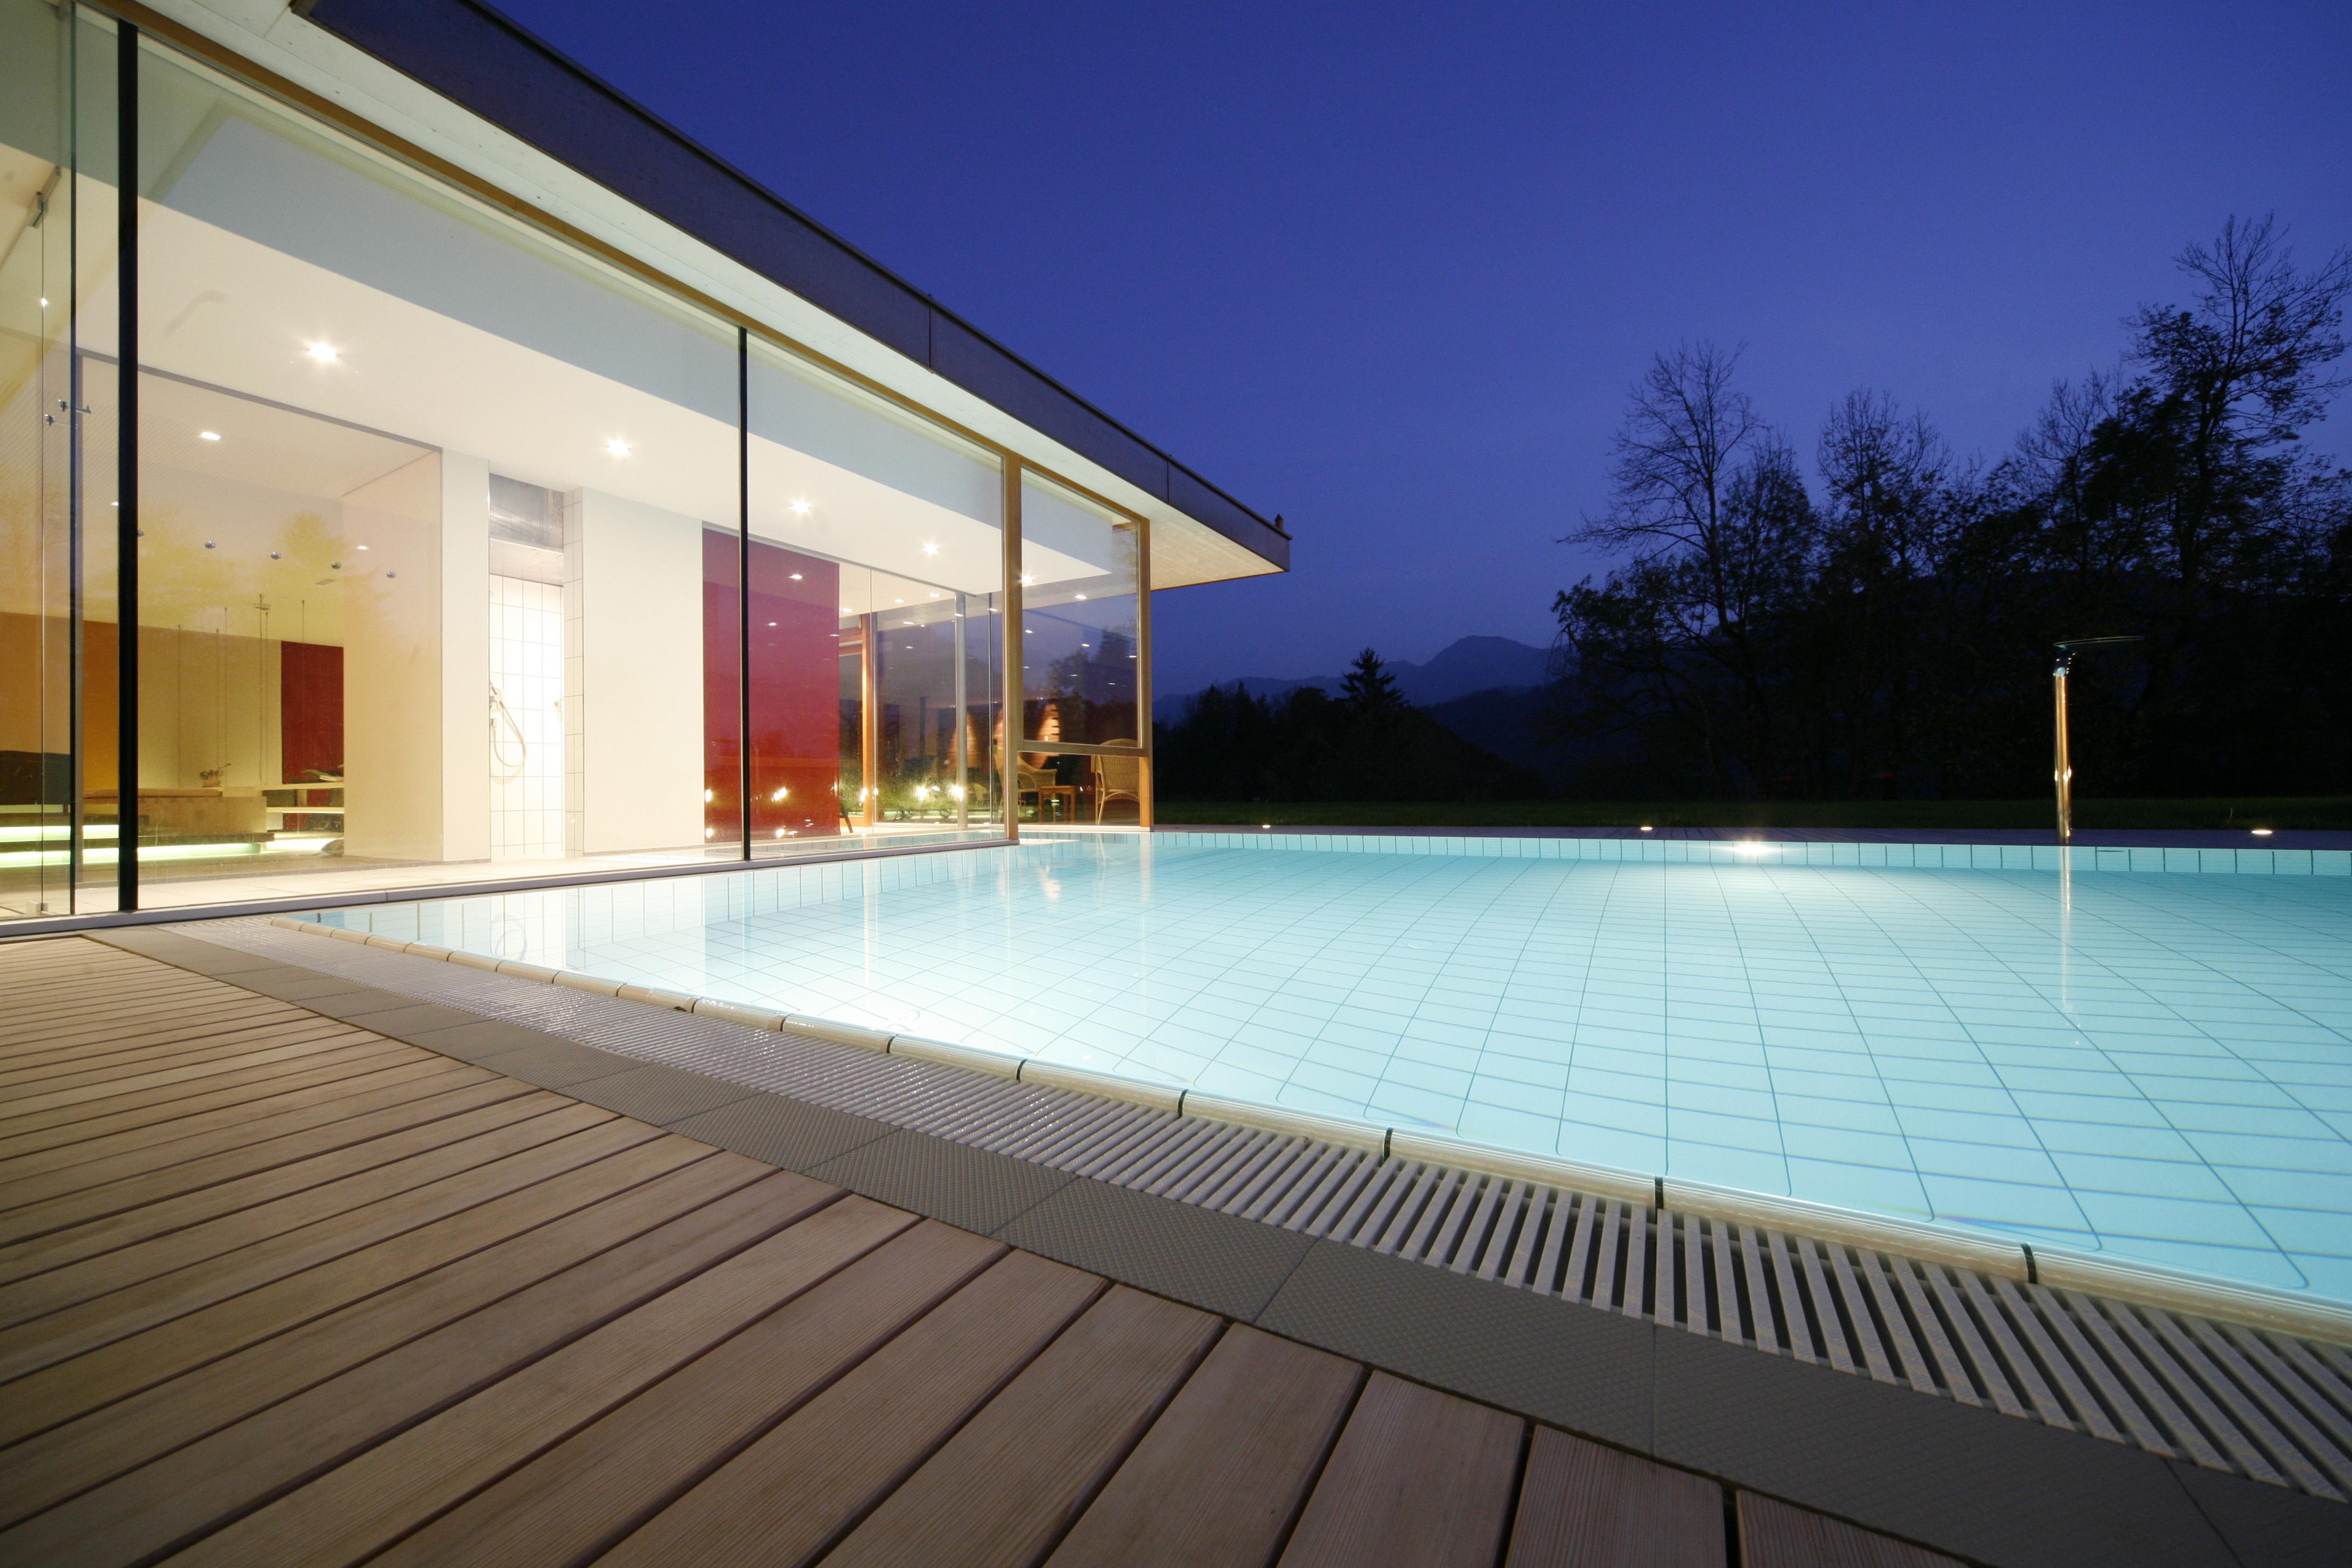 entspannen romantikhotel das schiff hittisau. Black Bedroom Furniture Sets. Home Design Ideas